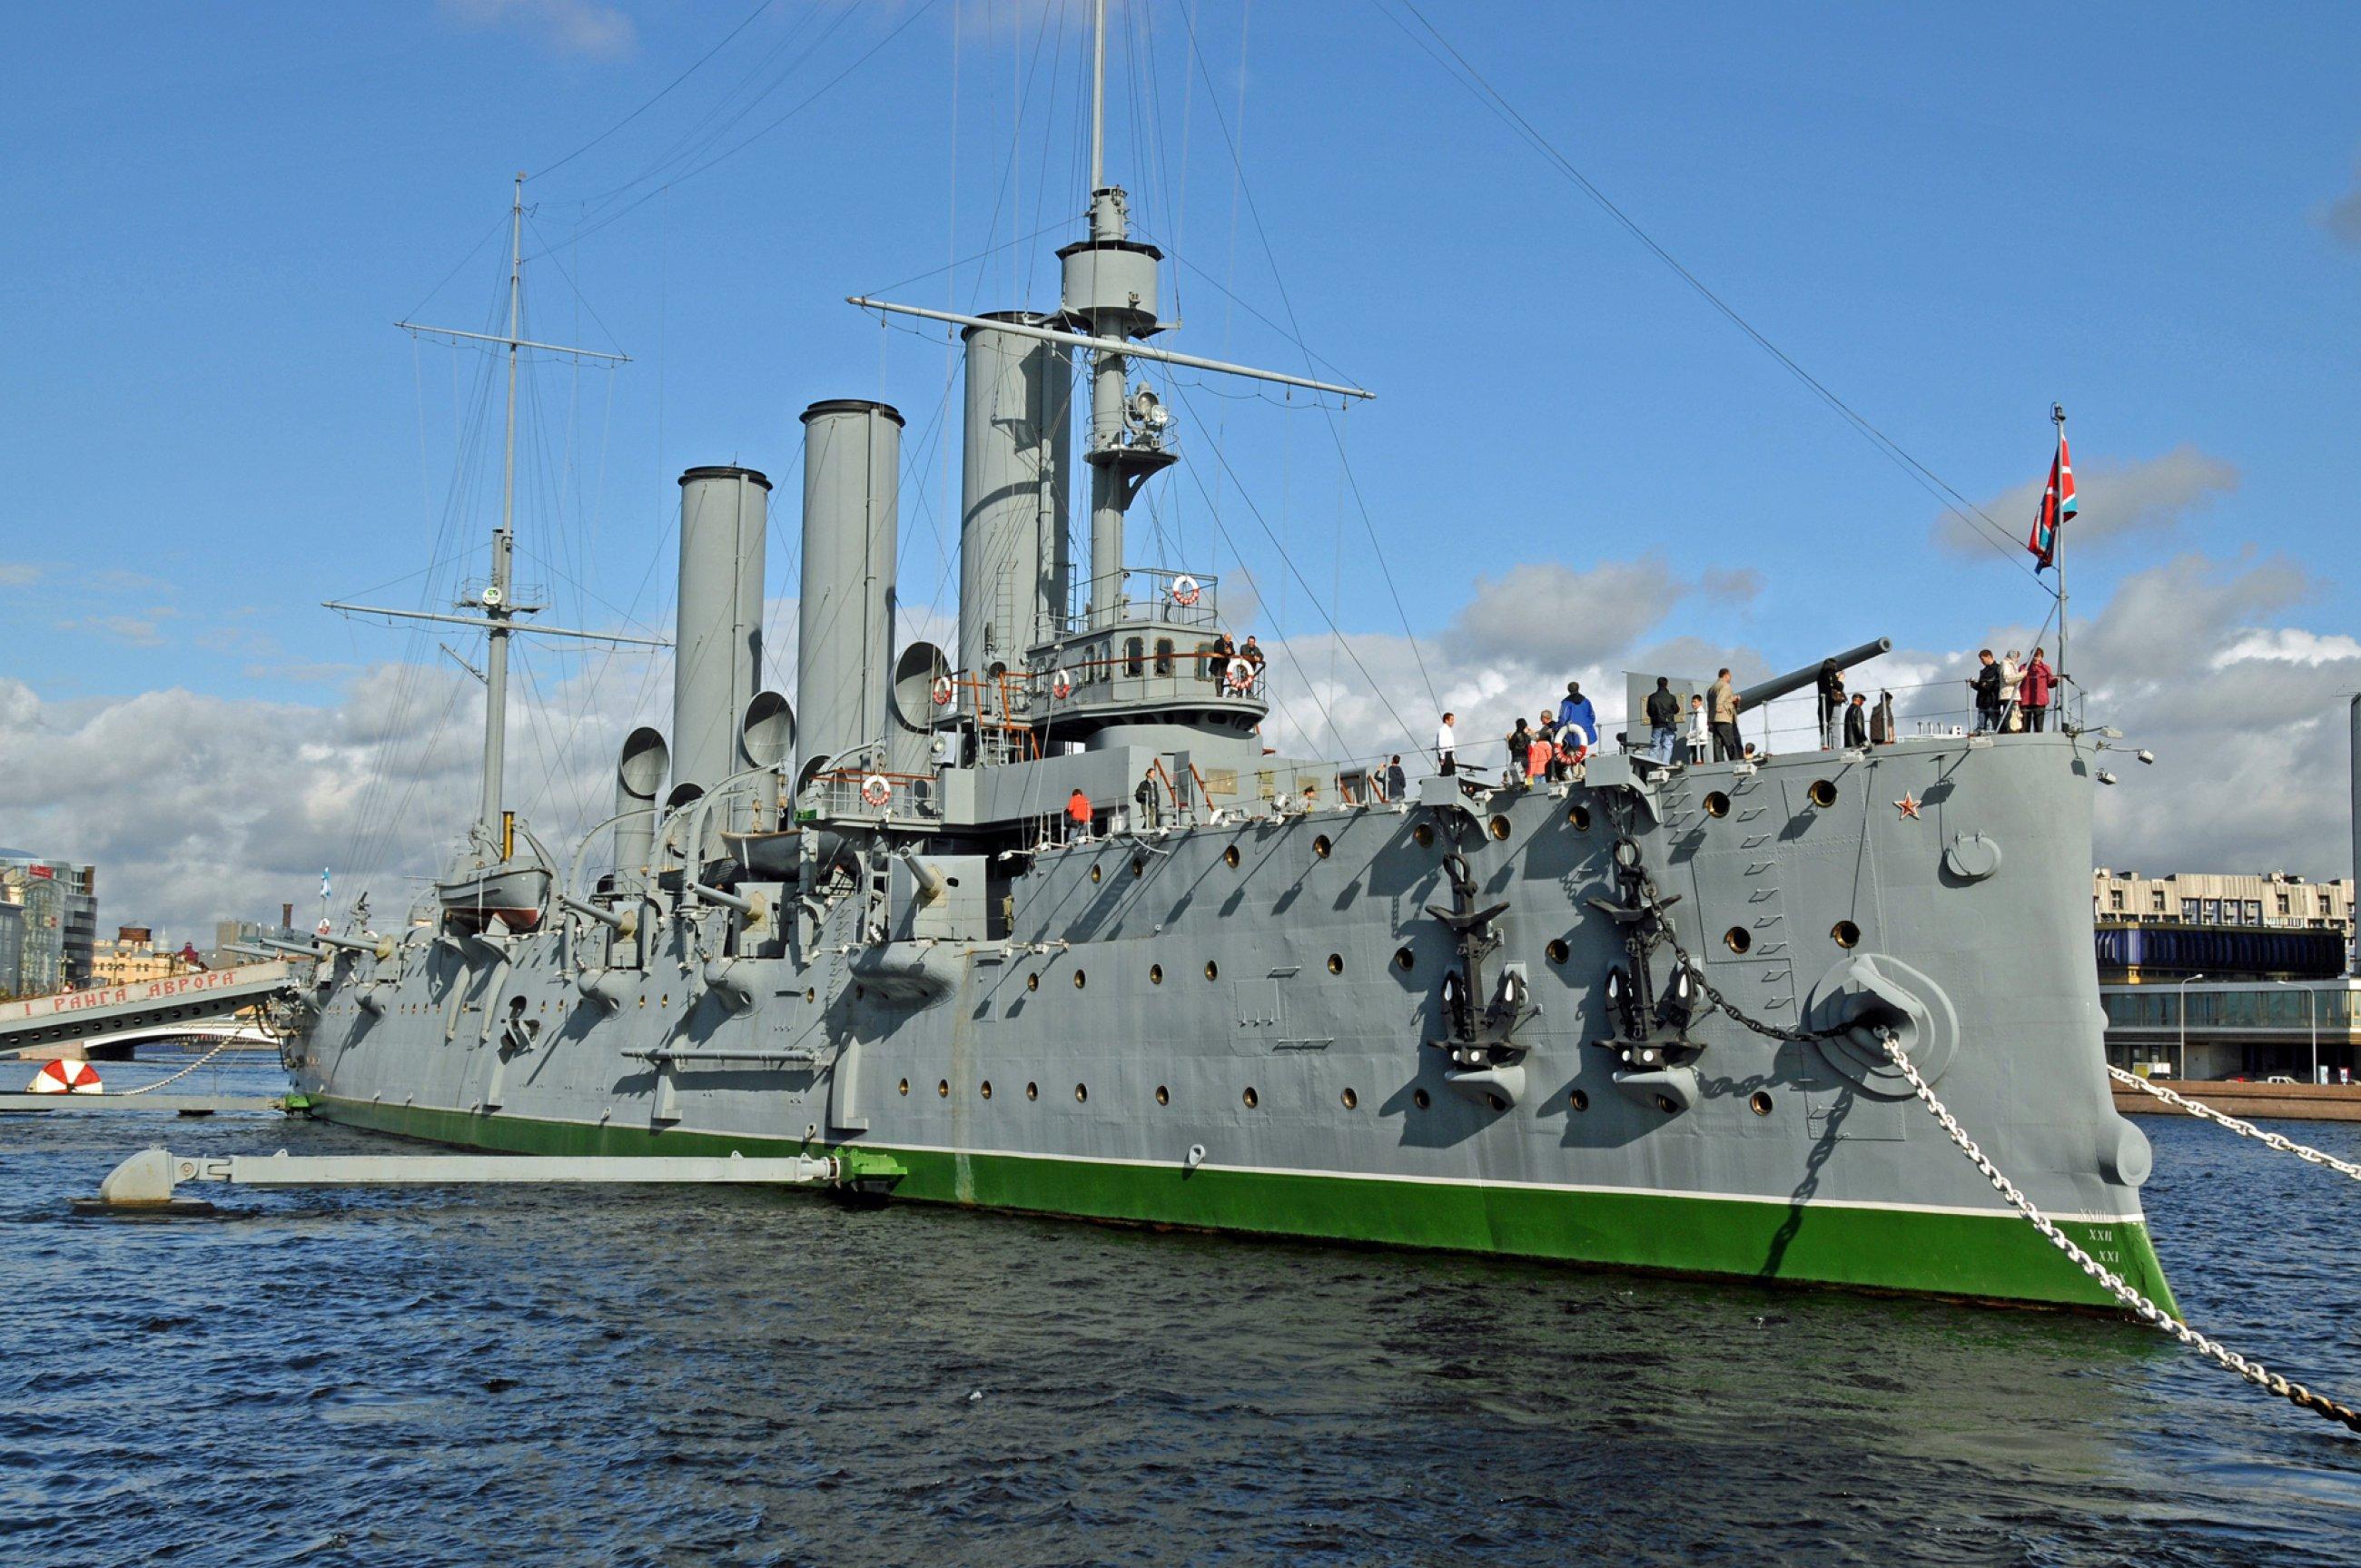 https://bubo.sk/uploads/galleries/5056/wikipedia-russian-cruiser-aurora-moored-in-saint-petersburg-22-sept-2009.jpg